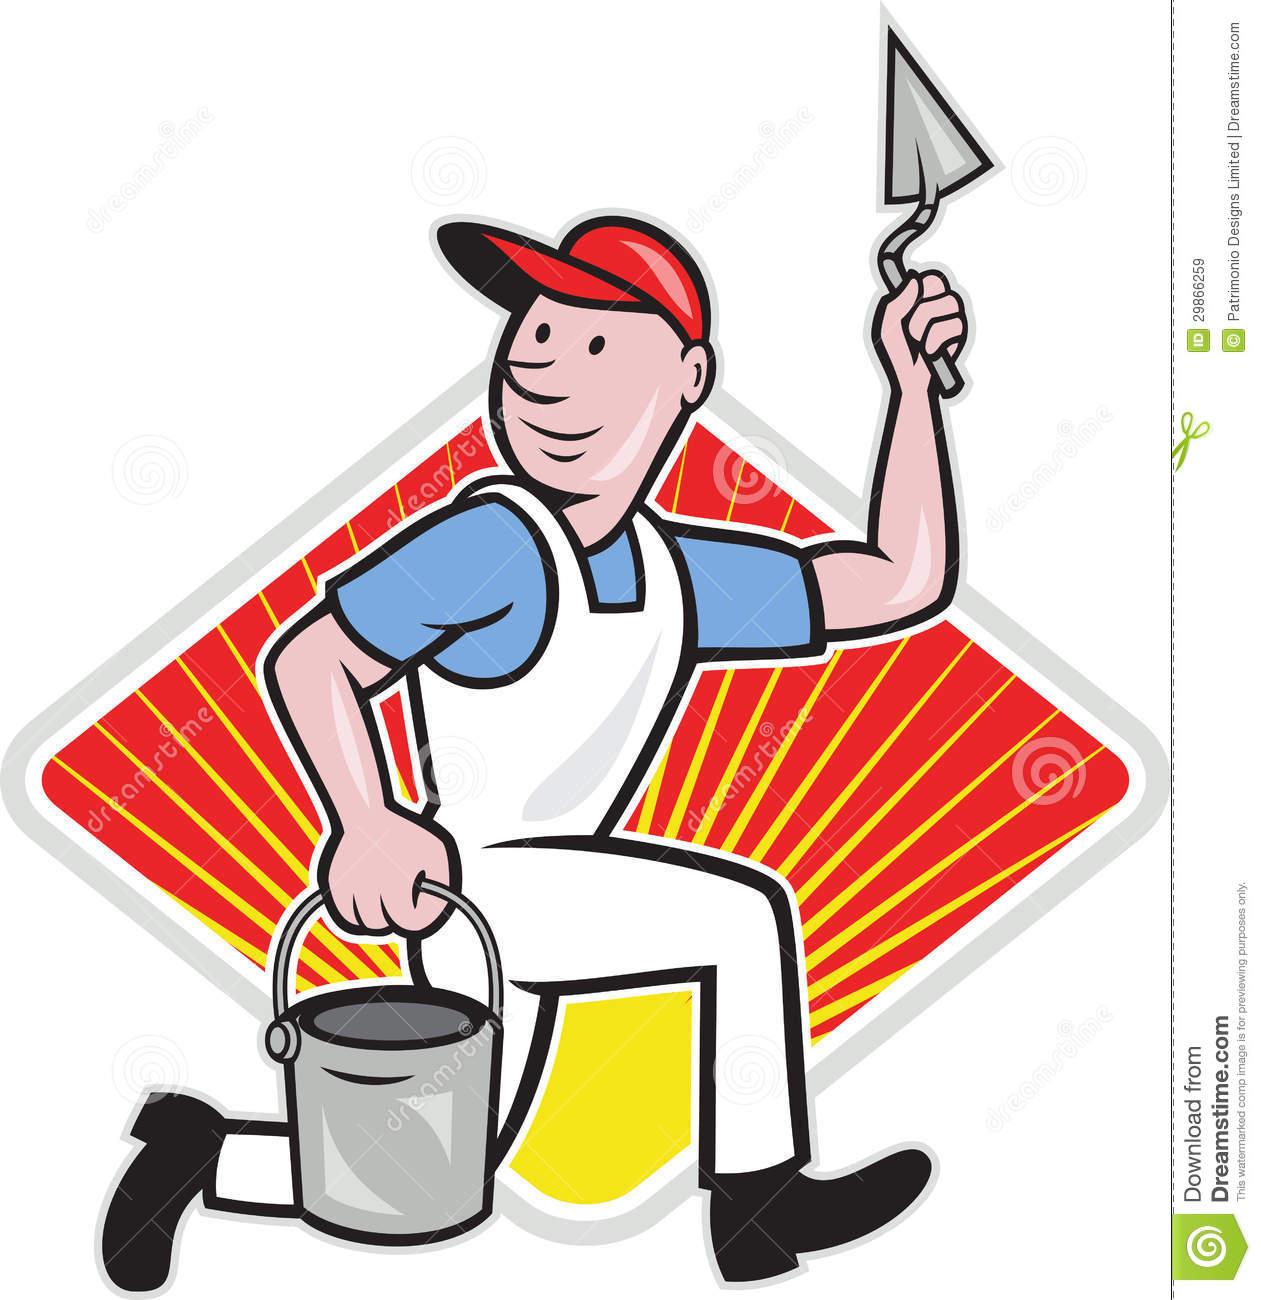 Plaster Masonry Worker Cartoon Royalty Free Stock Images.